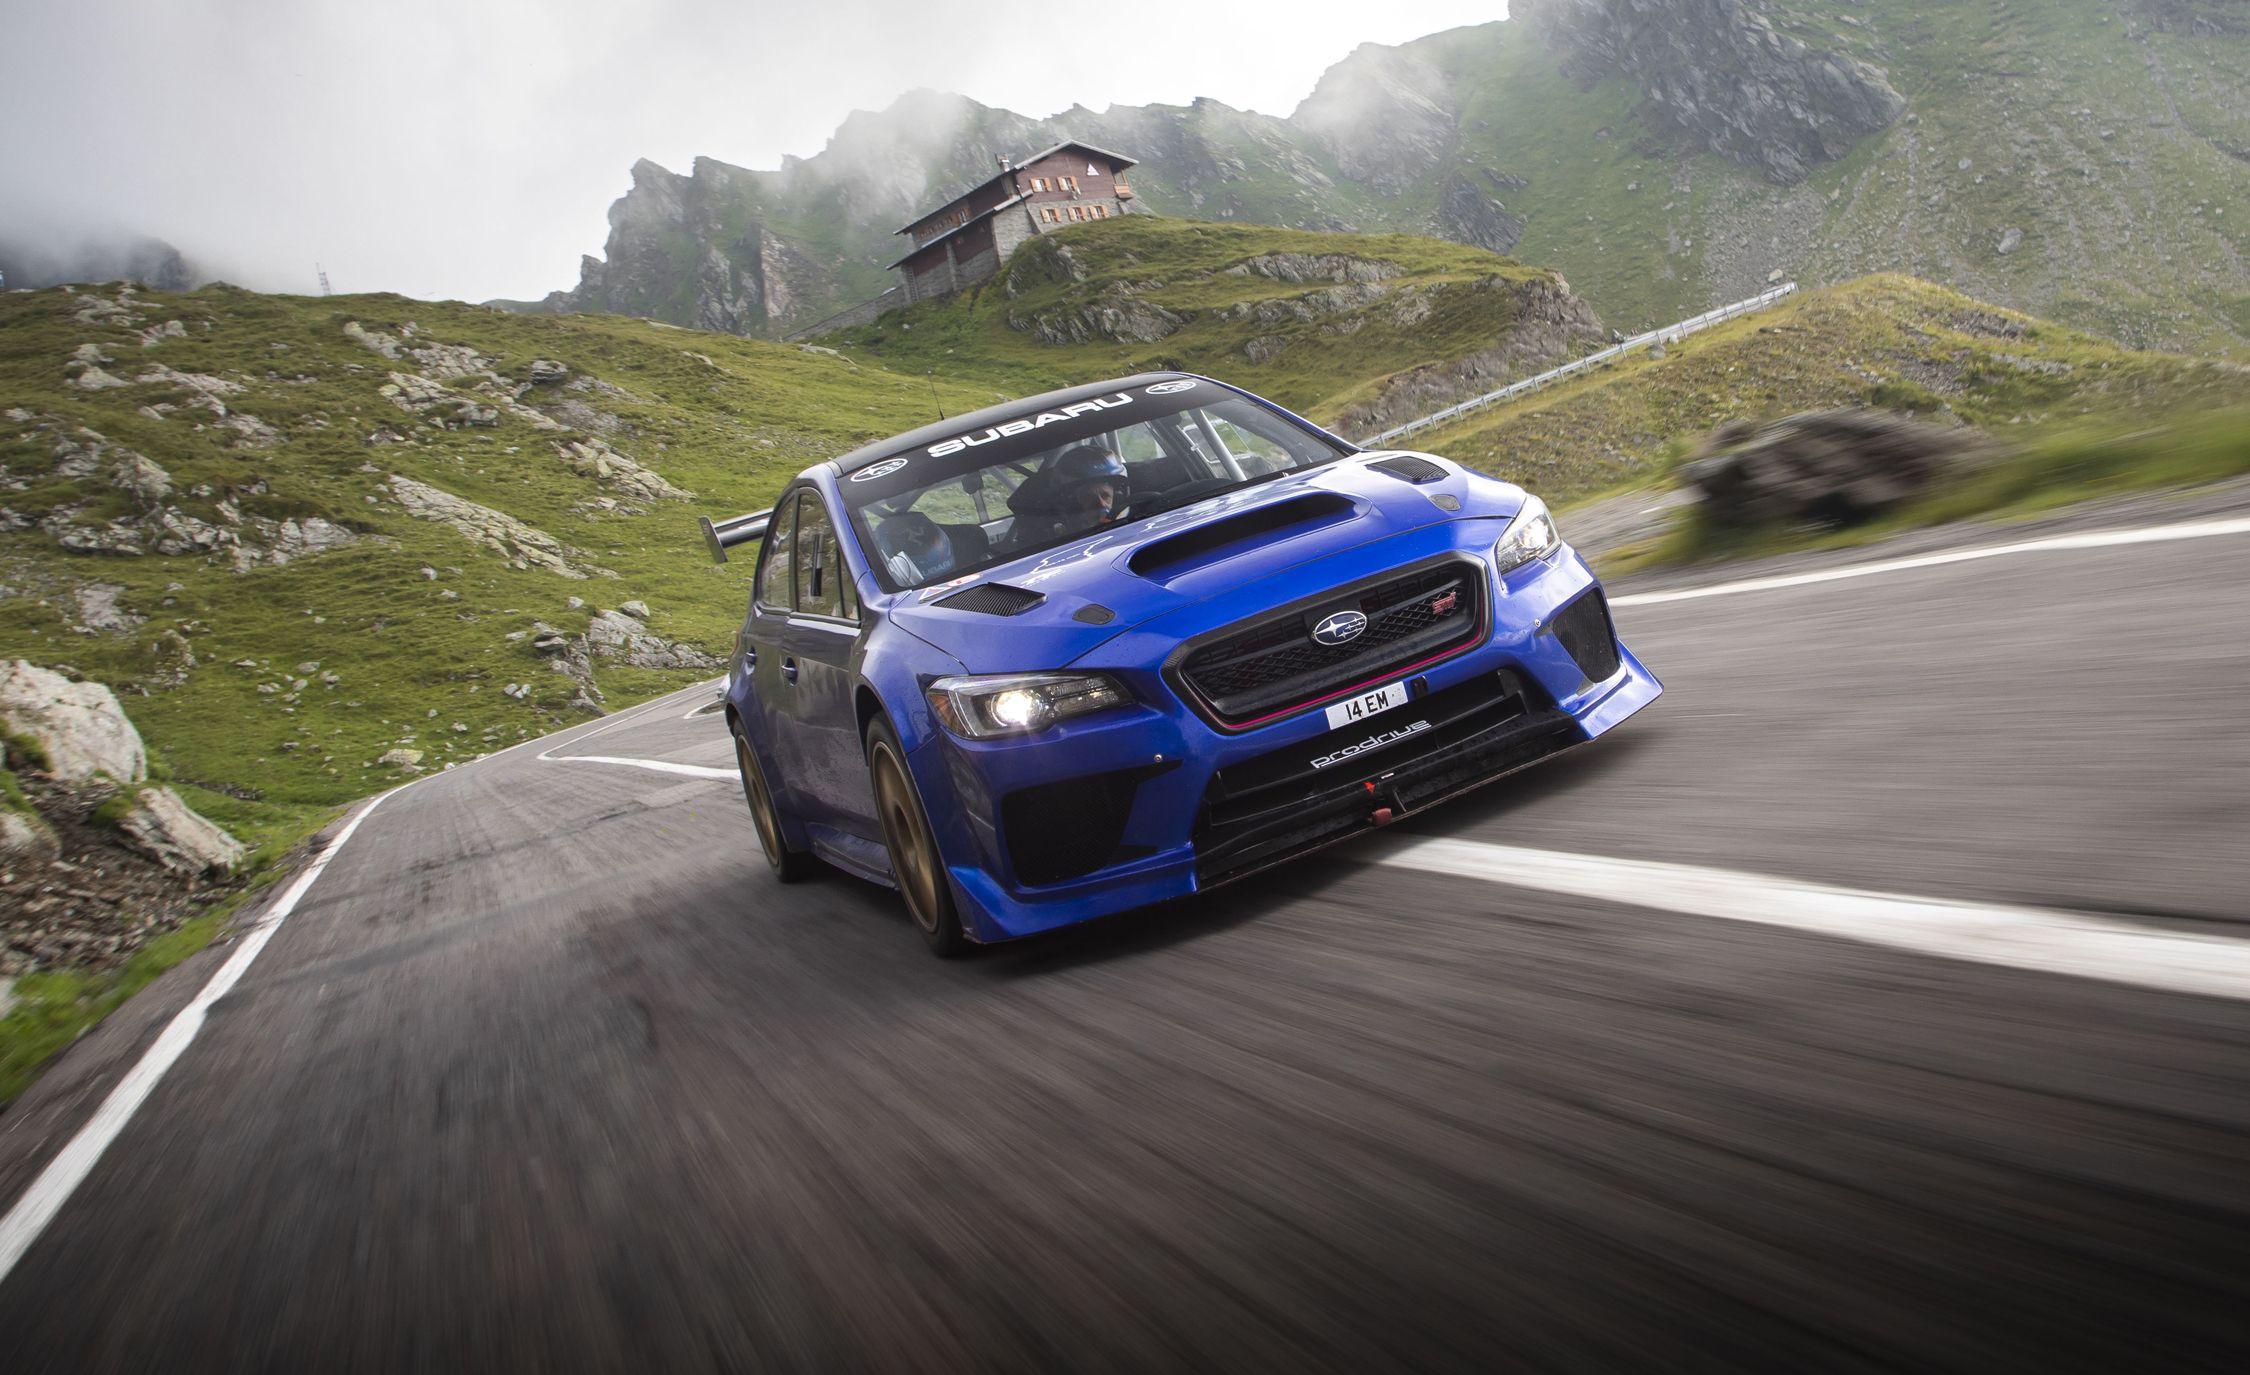 Subaru WRX STI Type RA Time Attack Makes a Record Run in the Romanian Mountains